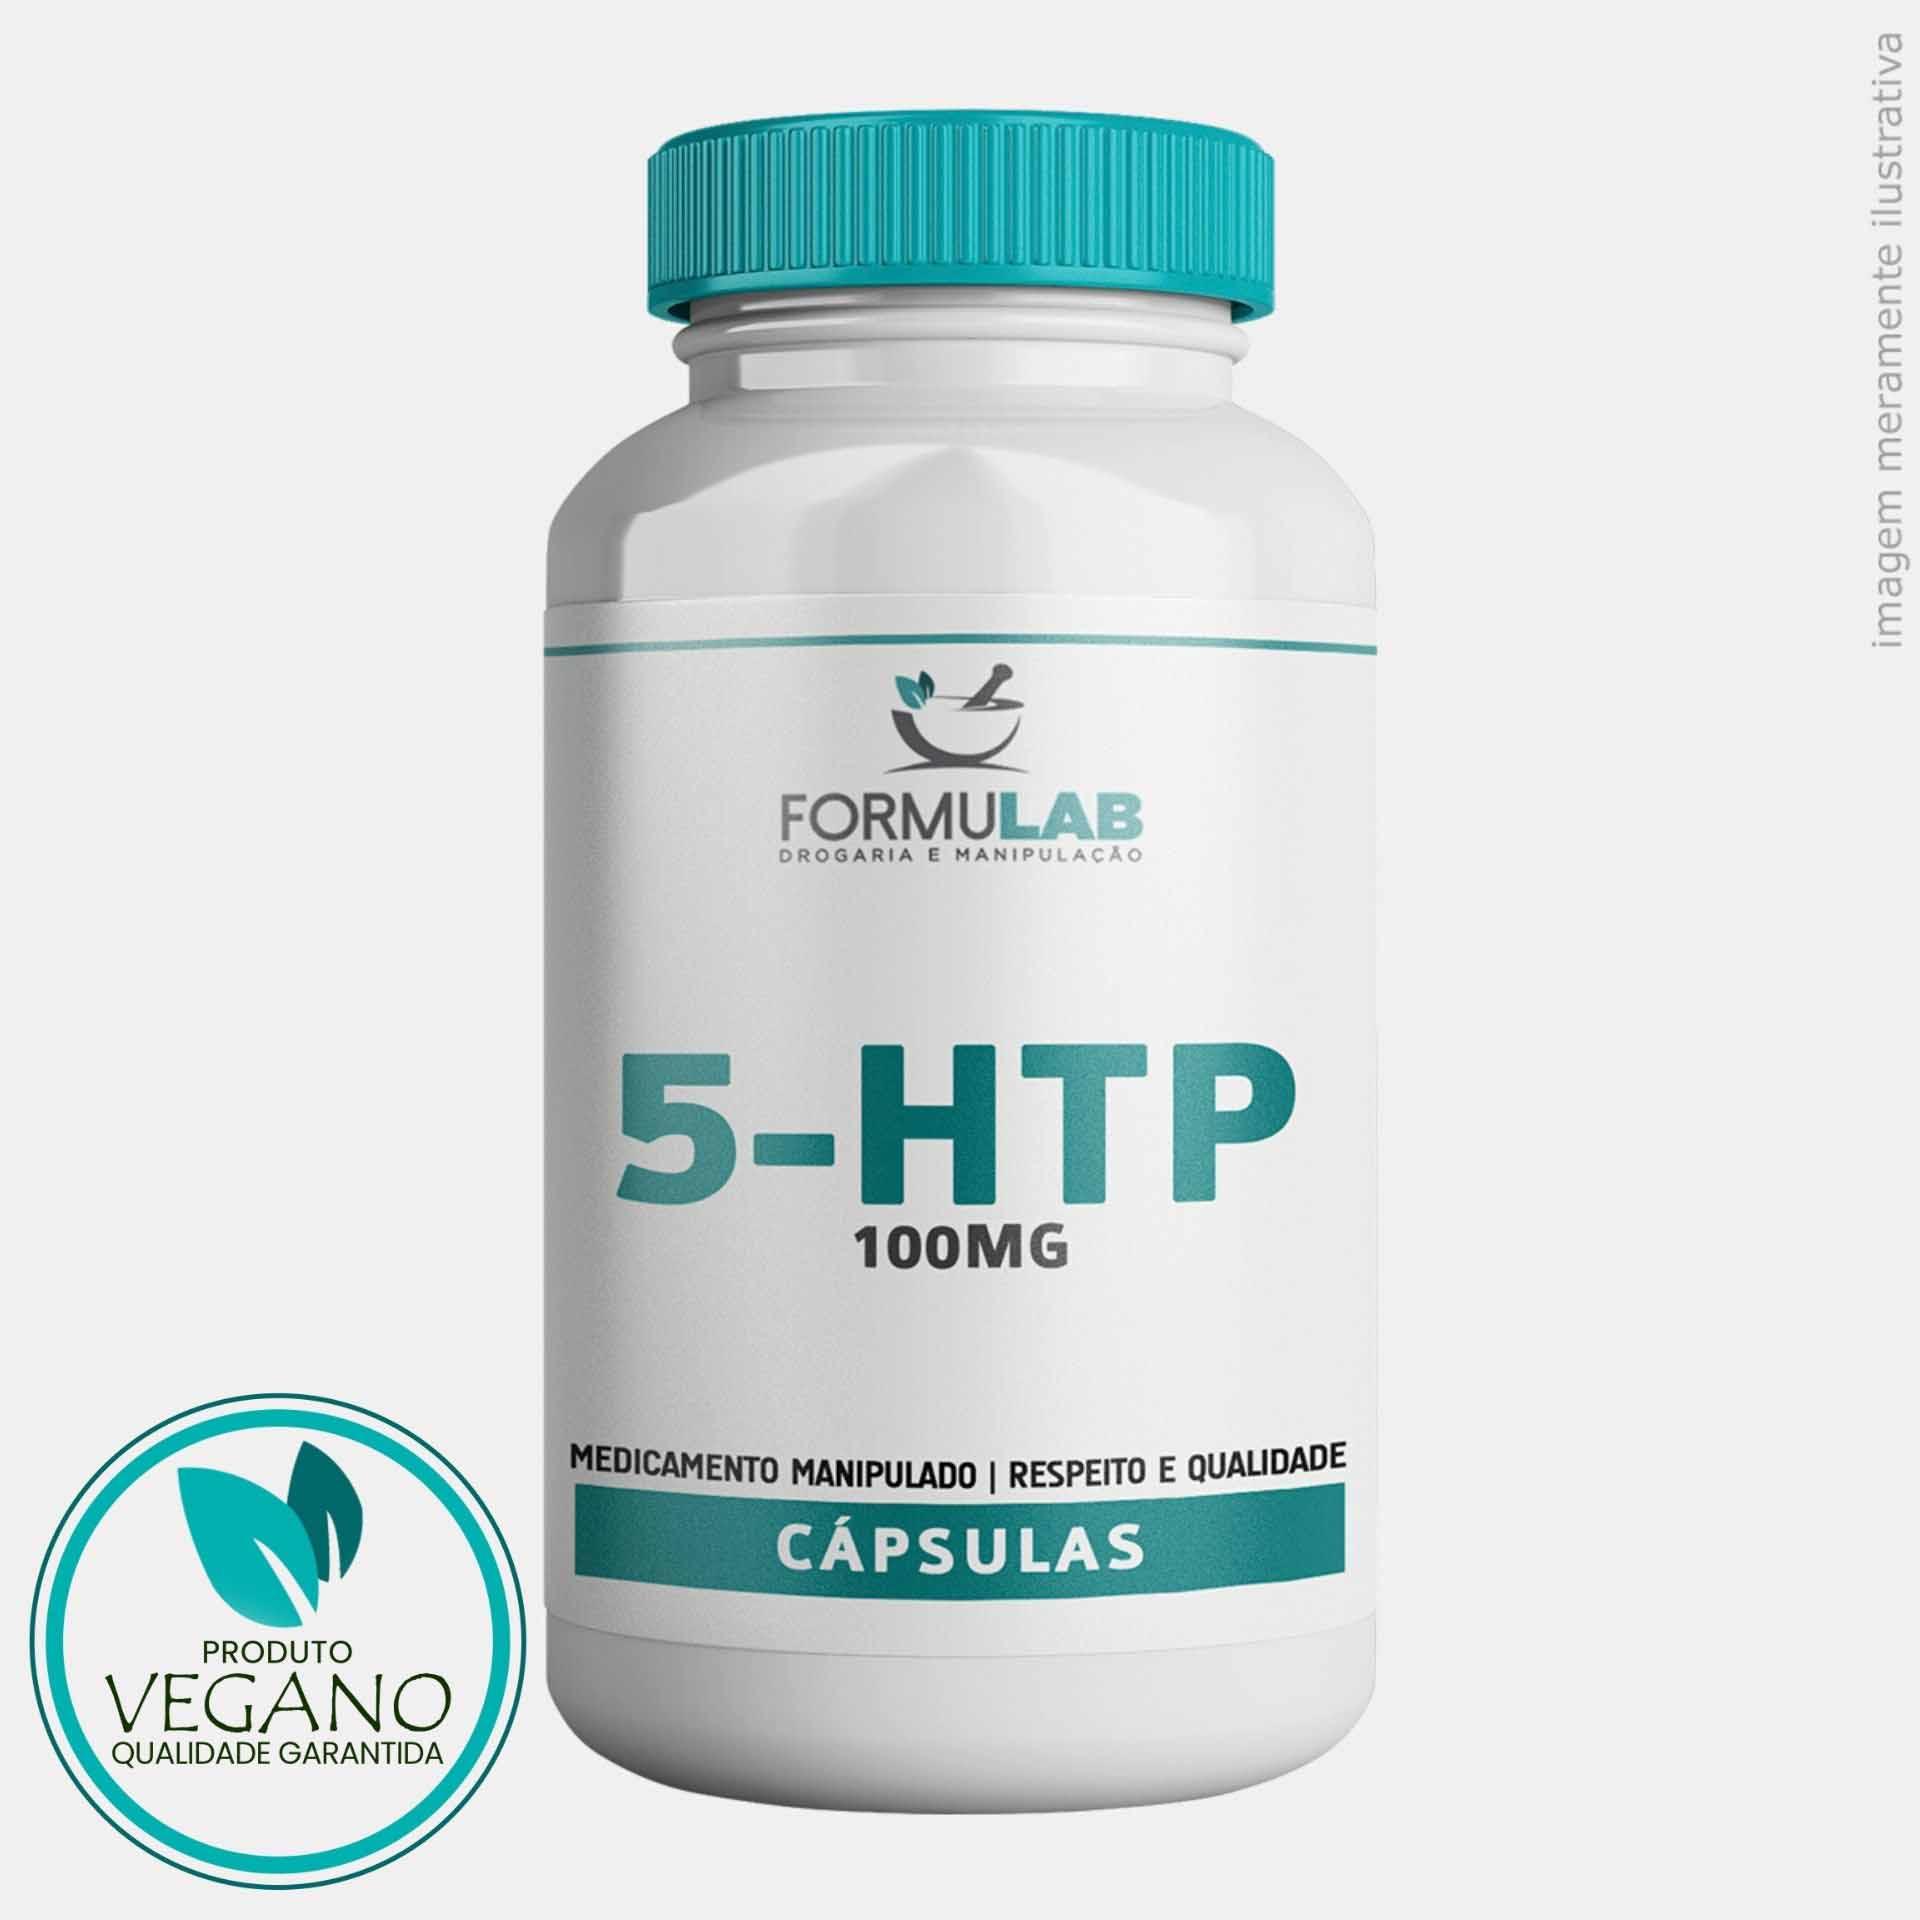 5-HTP - L-5-Hidroxitriptofano - 100mg - VEGANO